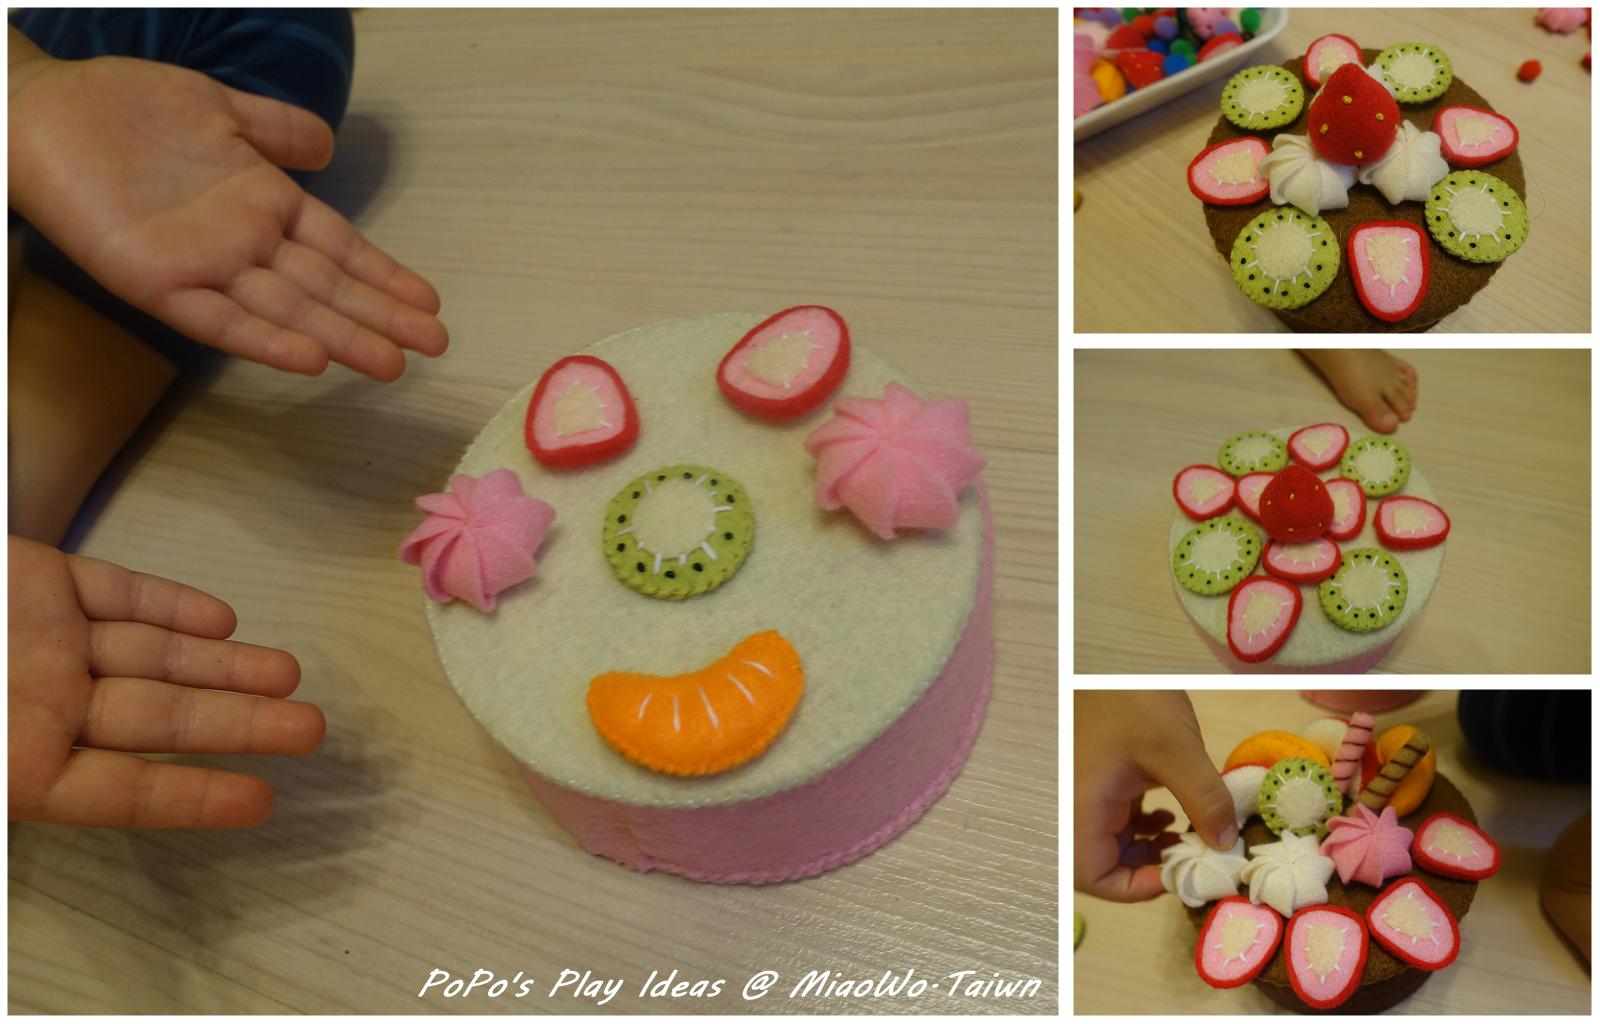 Make your cake-08.jpg